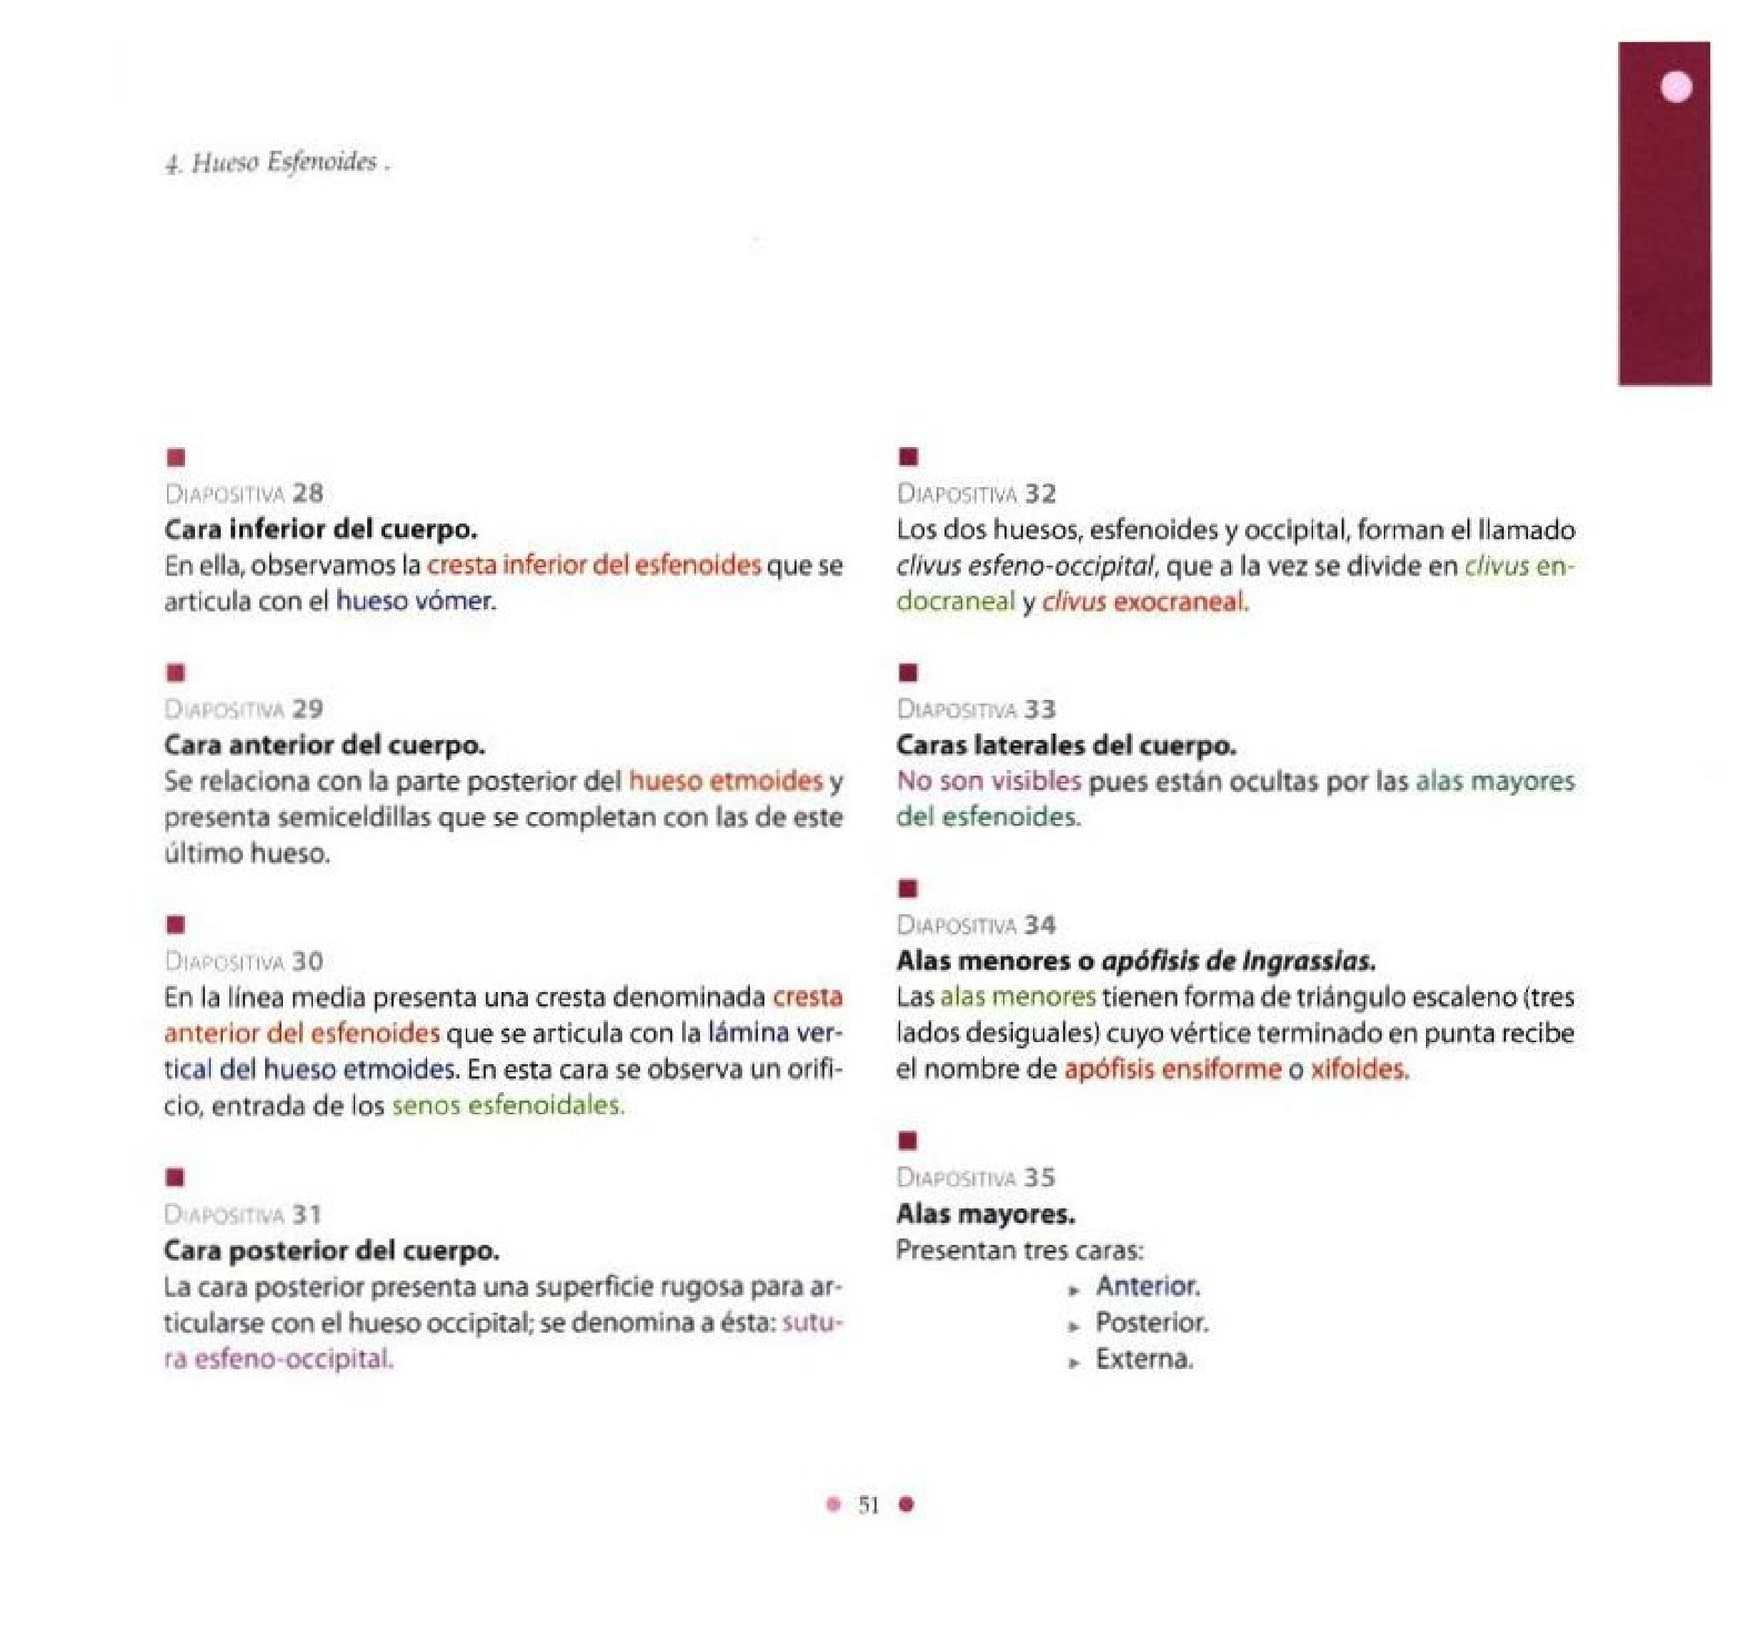 Anatomia Radiologica en Norma Lateral - CALAMEO Downloader